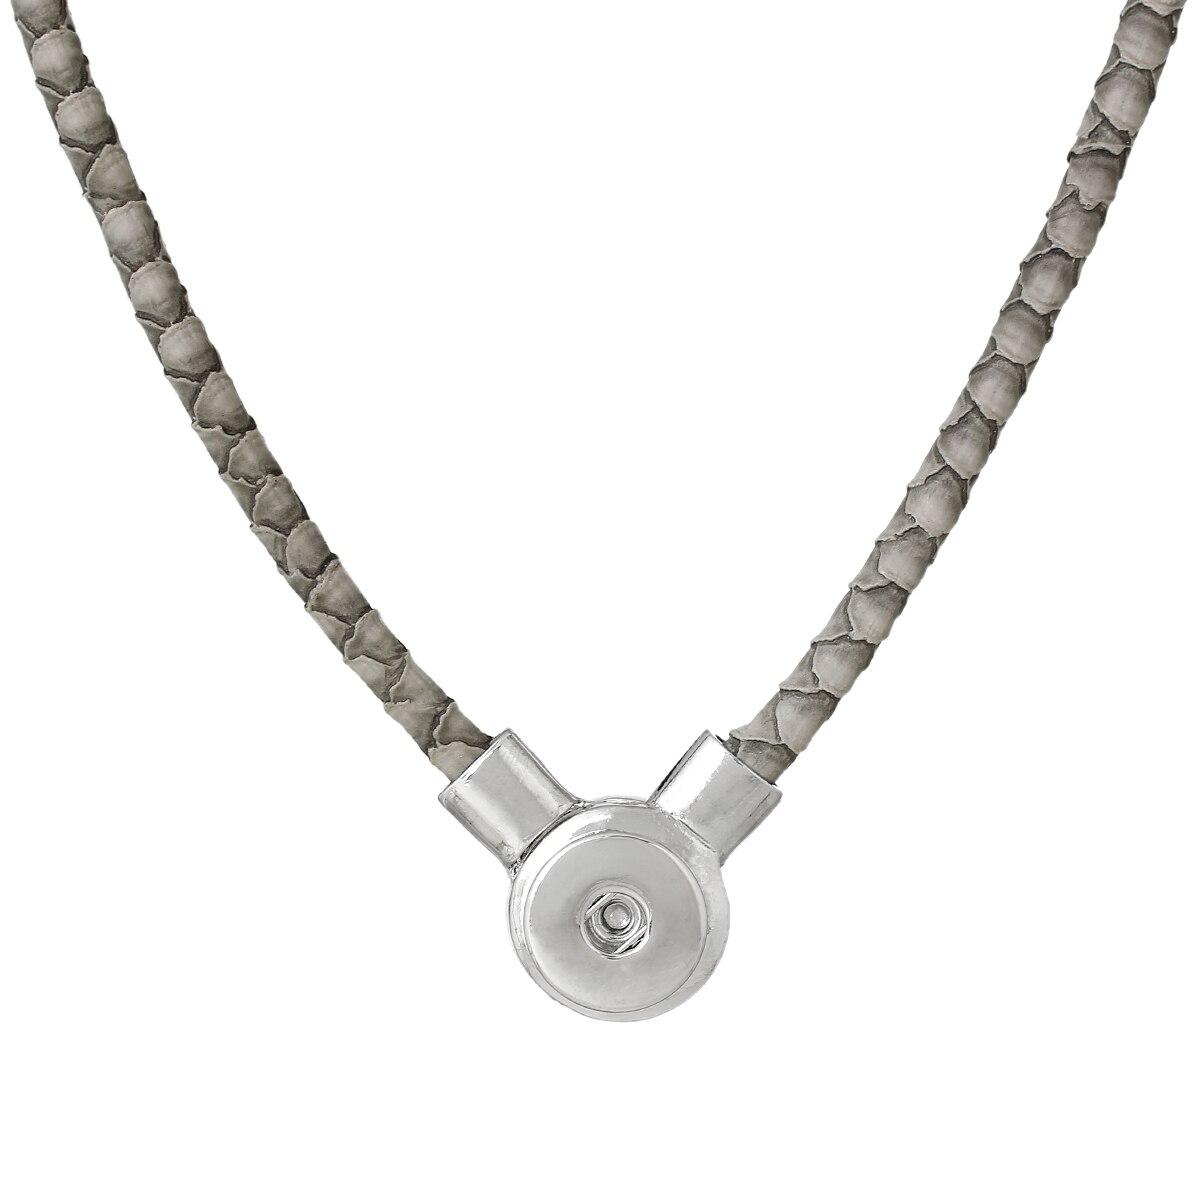 "8SEASONS PU Fashion Snap Jewelry Necklace Gray Silver Tone 50cm x2.3cm(<font><b>19</b></font> 5/<font><b>8</b></font>"" <font><b>x</b></font> <font><b>7</b></font>/<font><b>8</b></font>""),Snap Charm Hole Size: 6mm,1 PC"